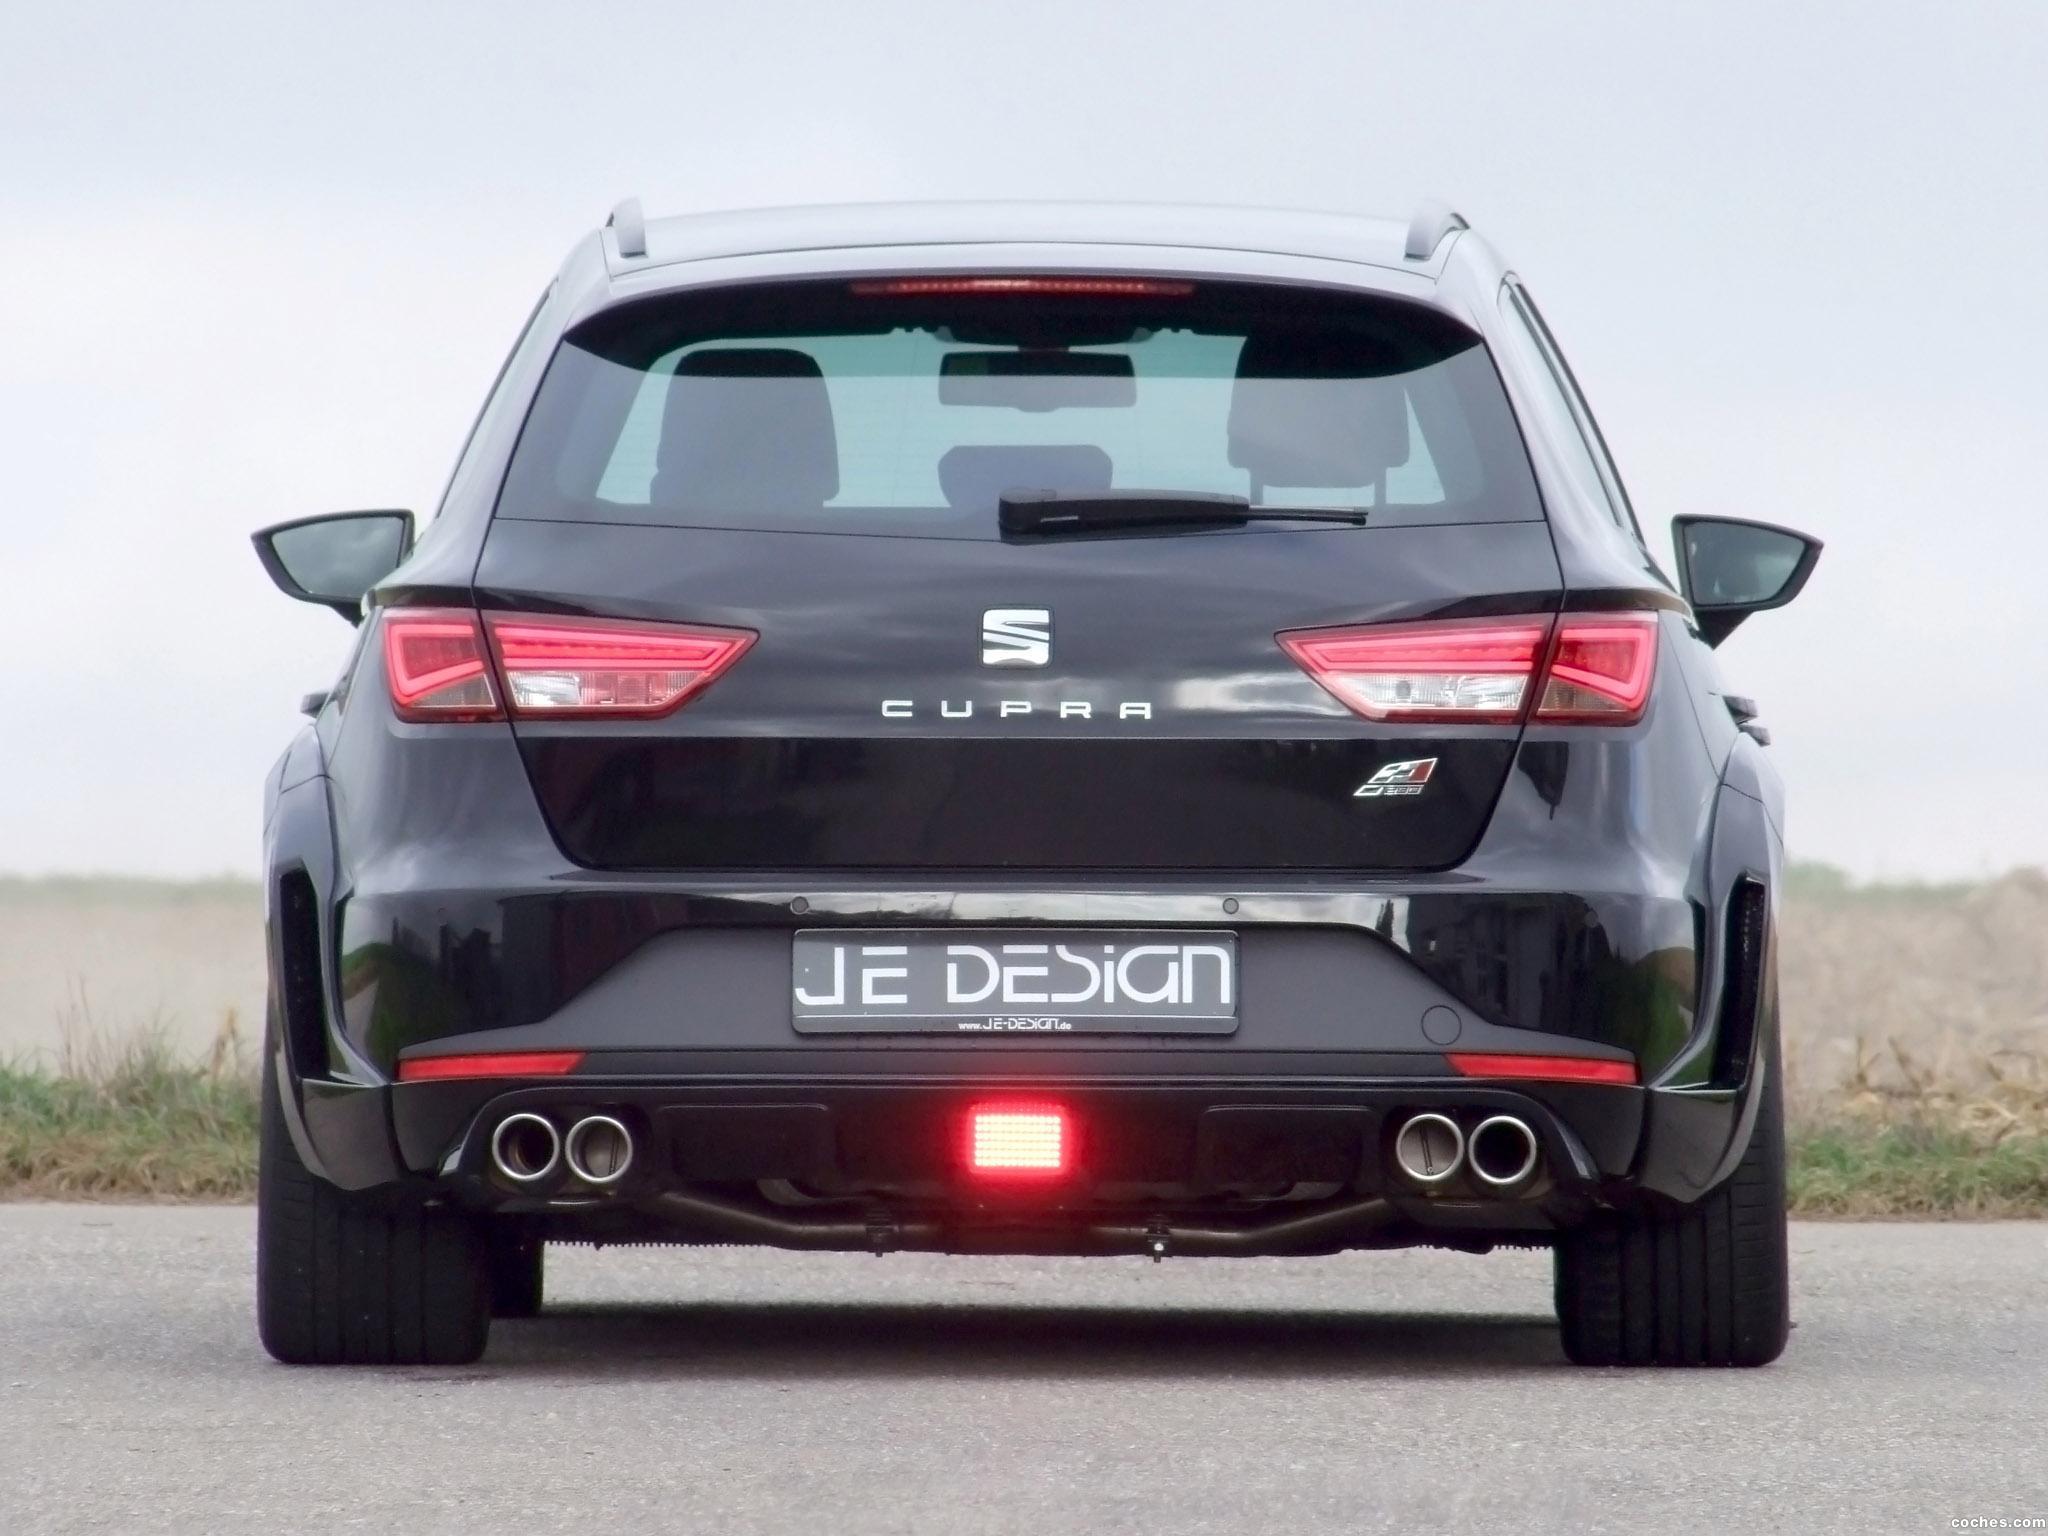 Foto 1 de JE Design Seat Leon ST Widebody 2015